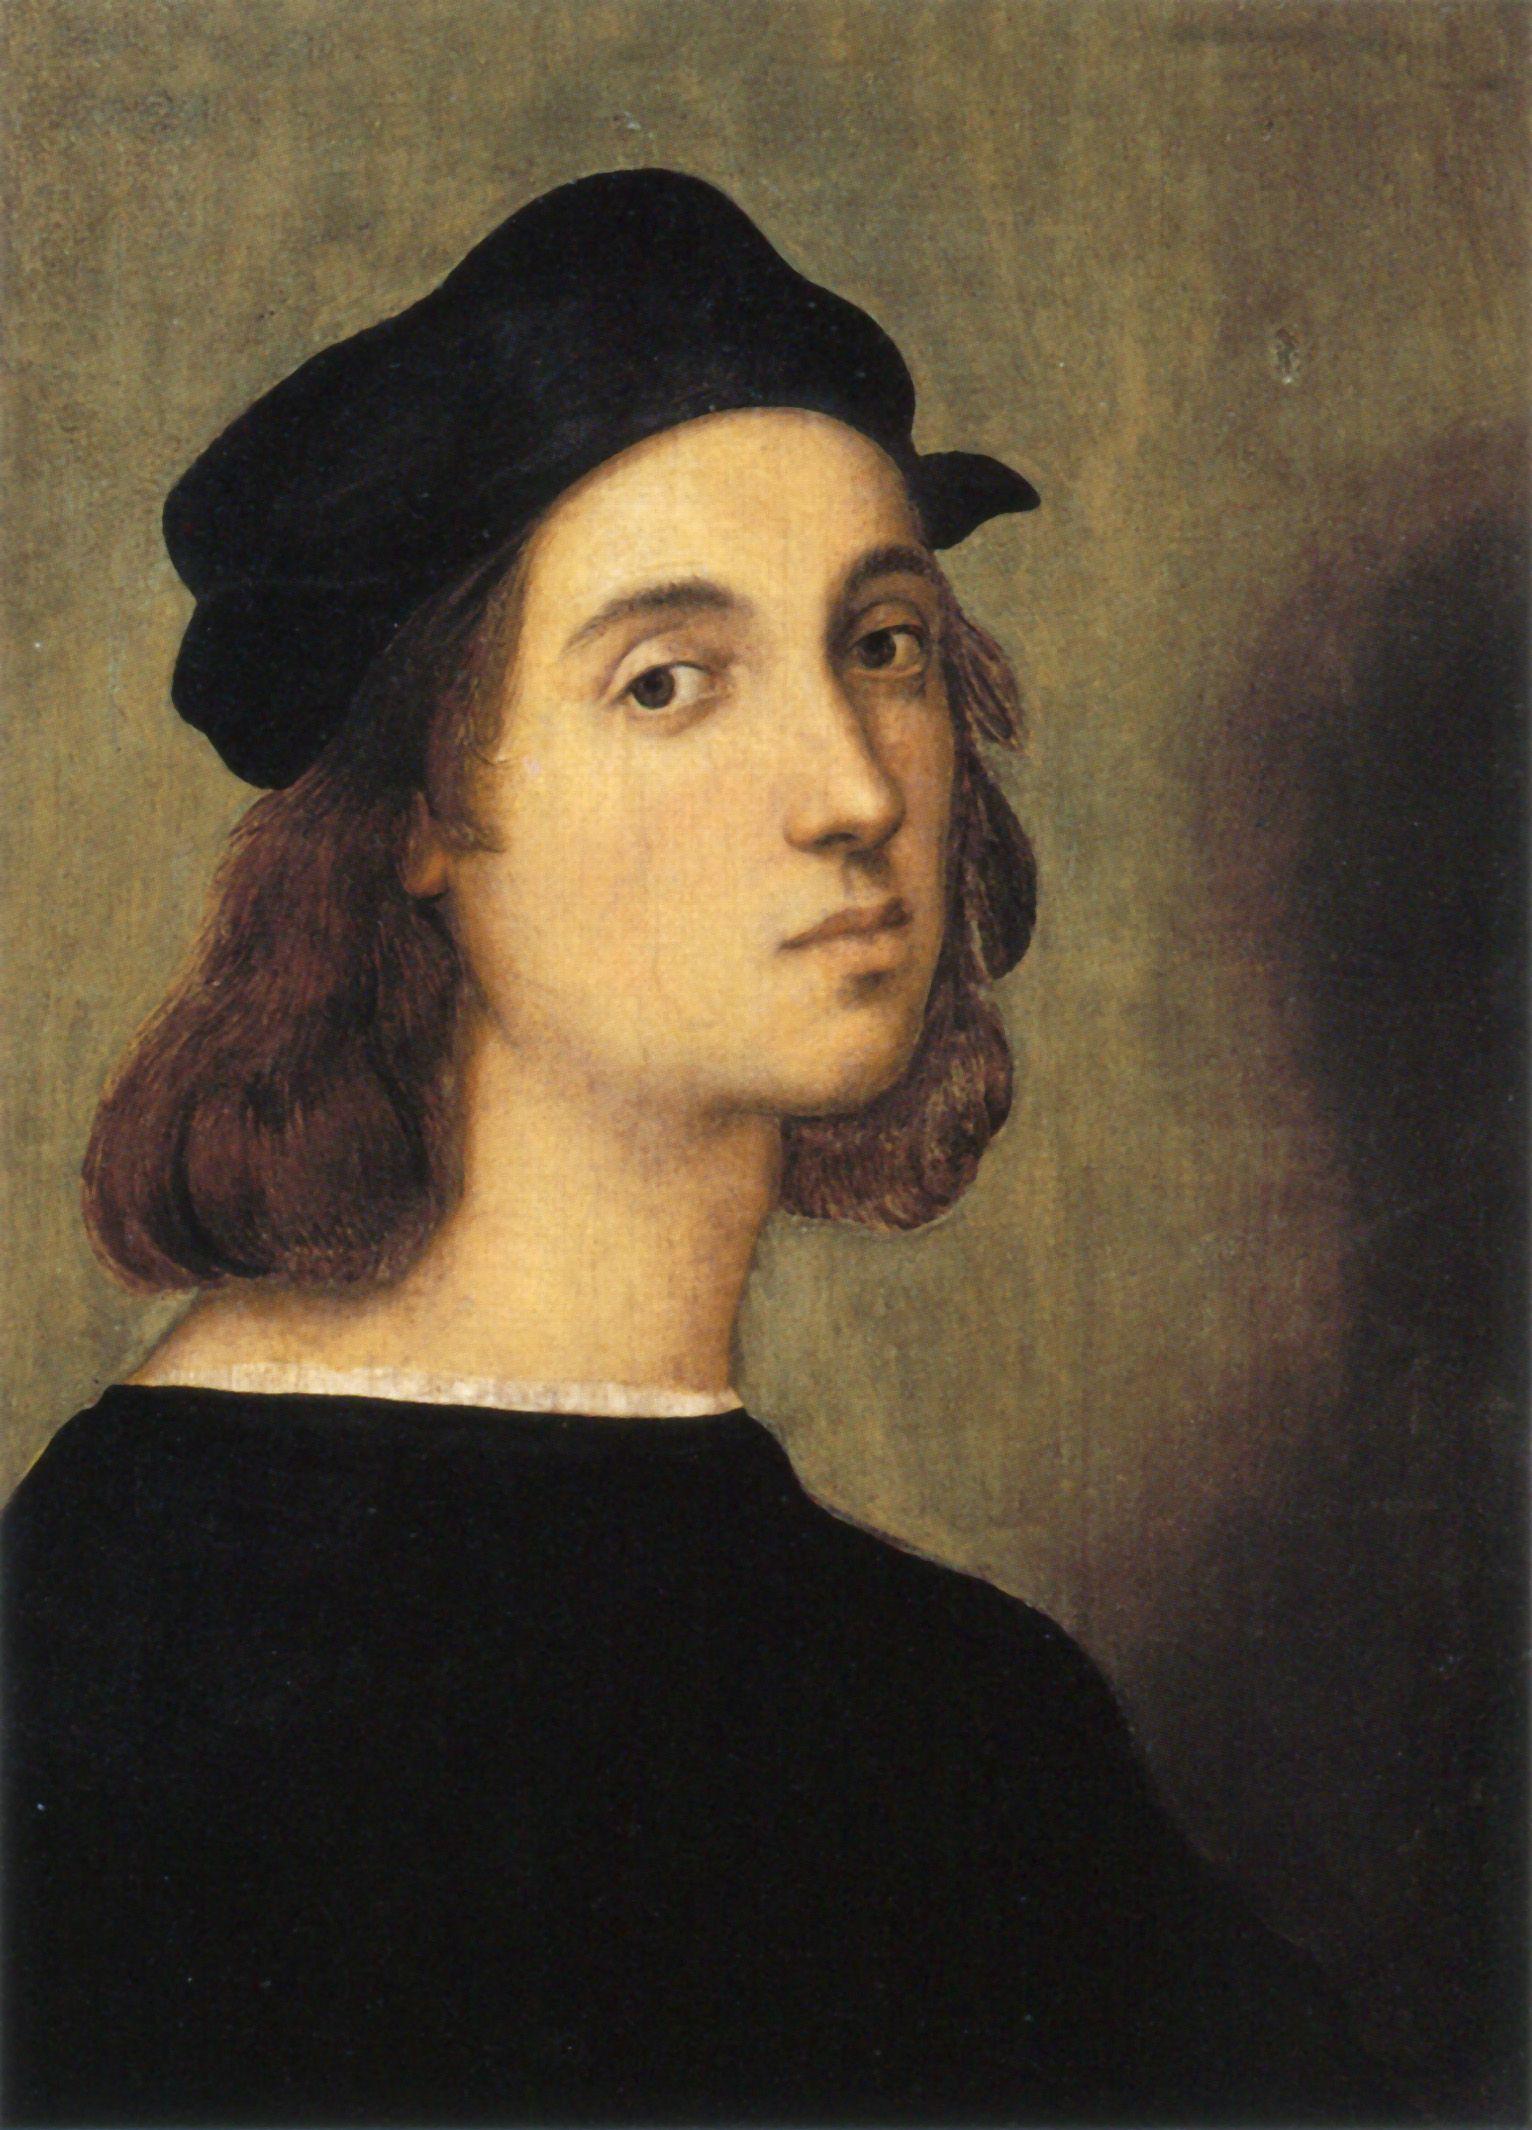 RAPHAEL Hailed as the greatest painter of the Renaissance